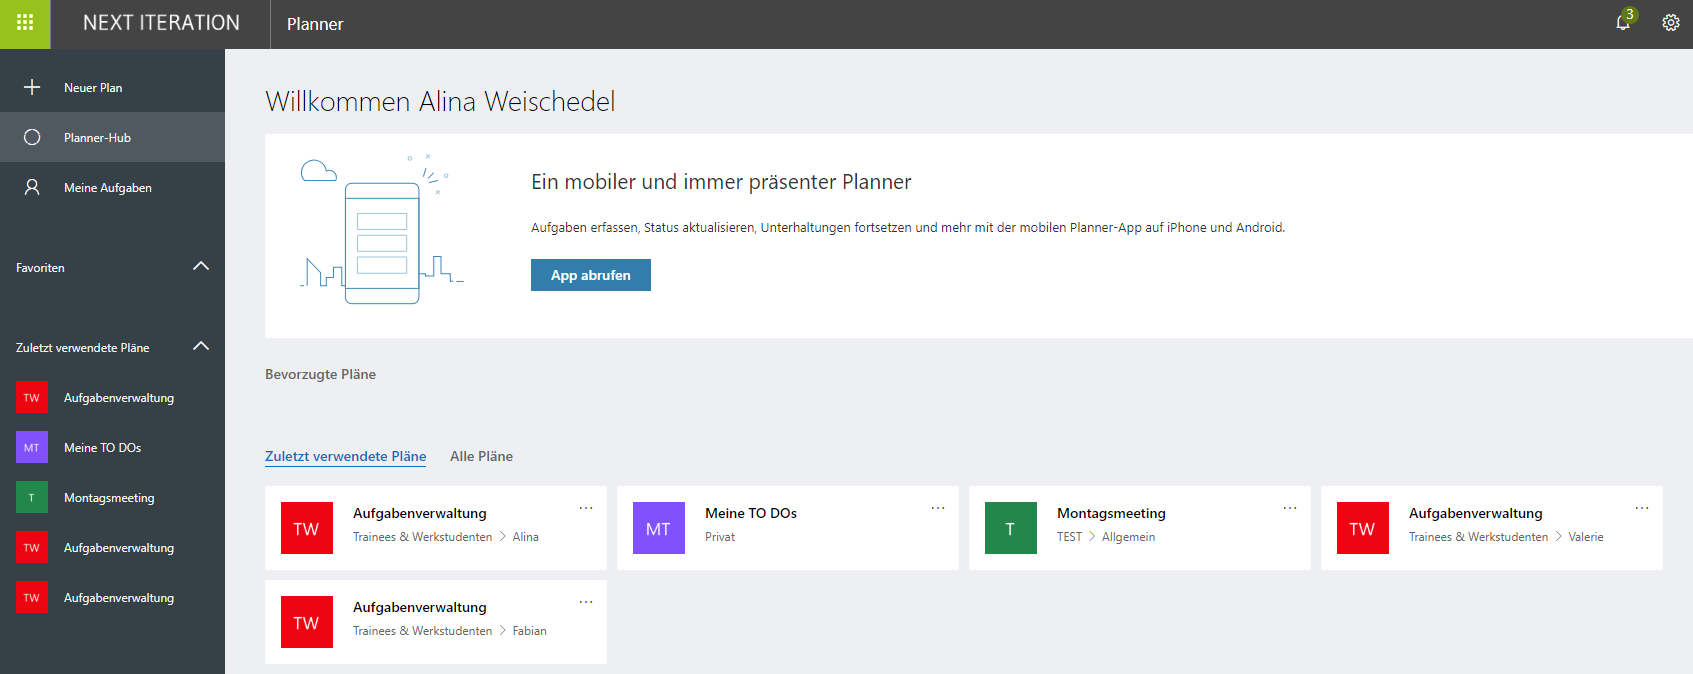 Microsoft Planner Oberfläche